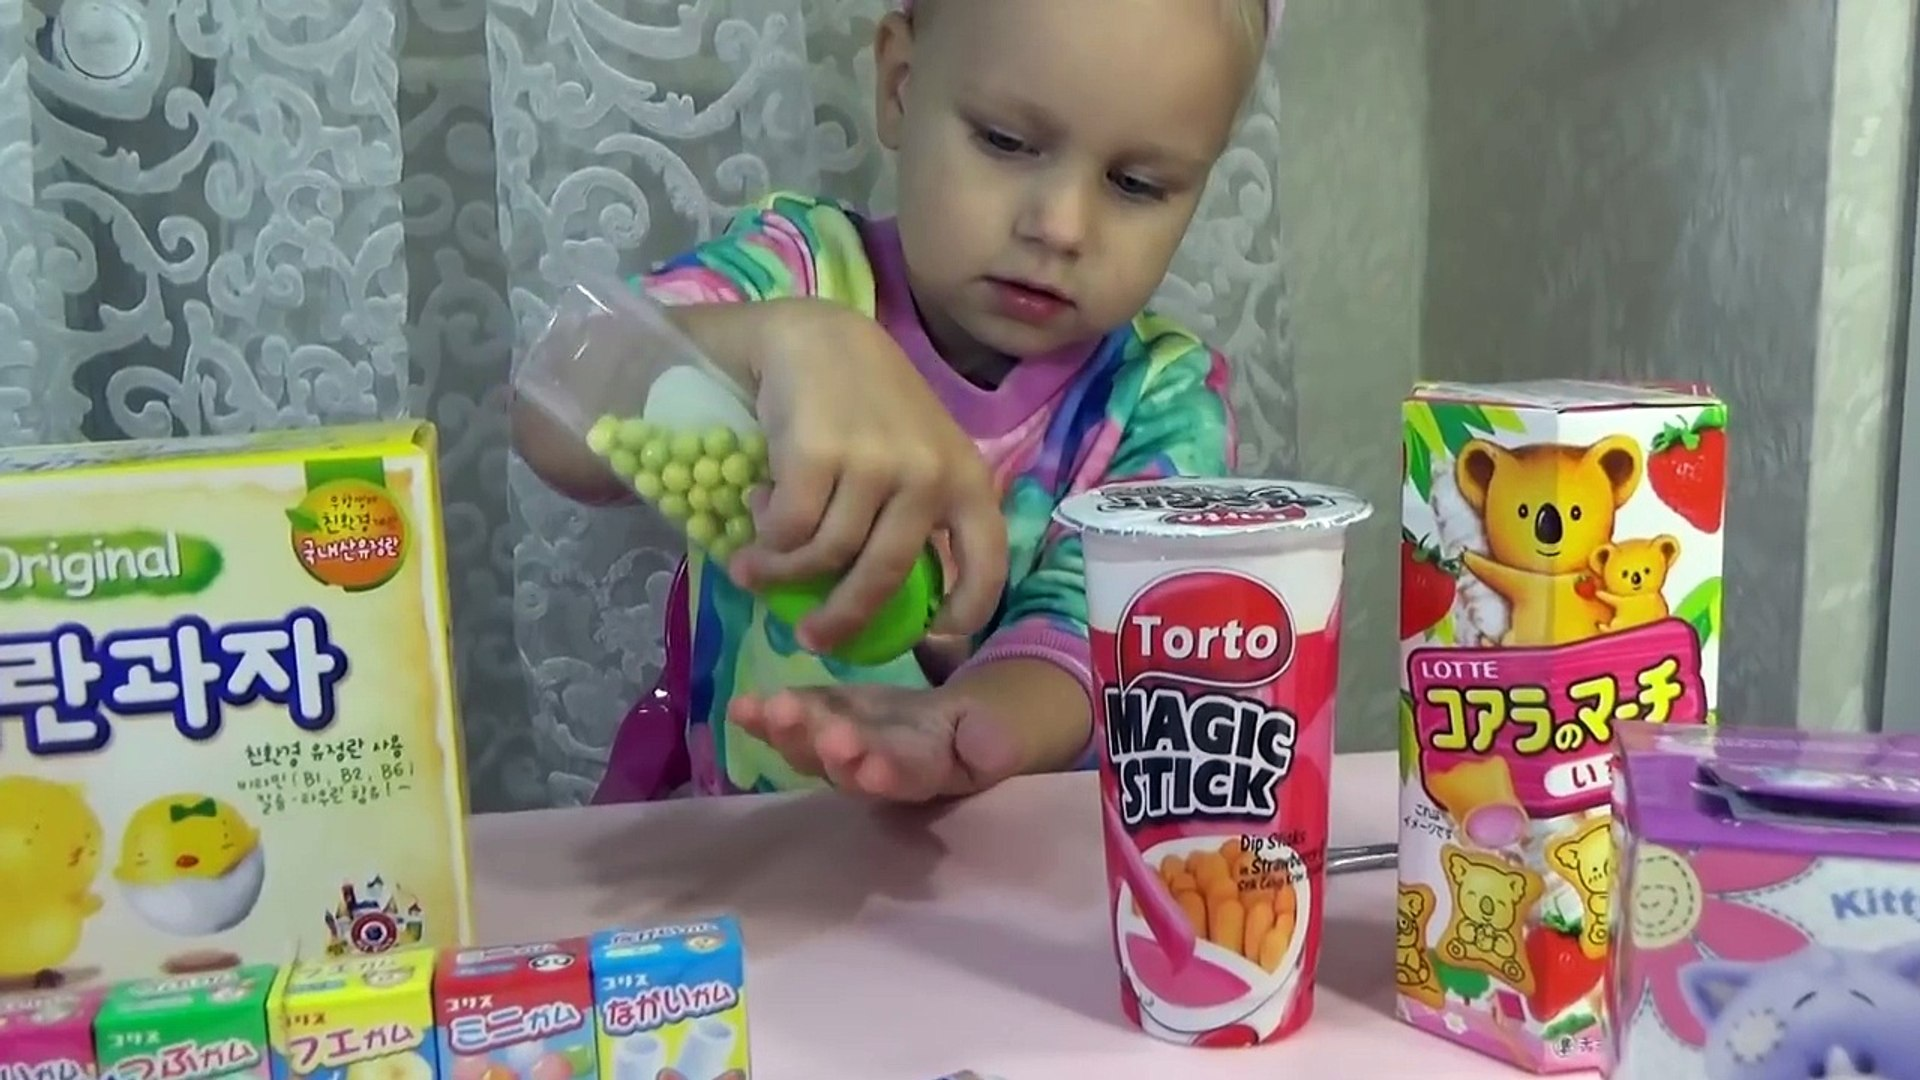 ВКУСНЯШКИ из Японии Алиса пробует Delicious products from Japan unboxing candy bubble gum